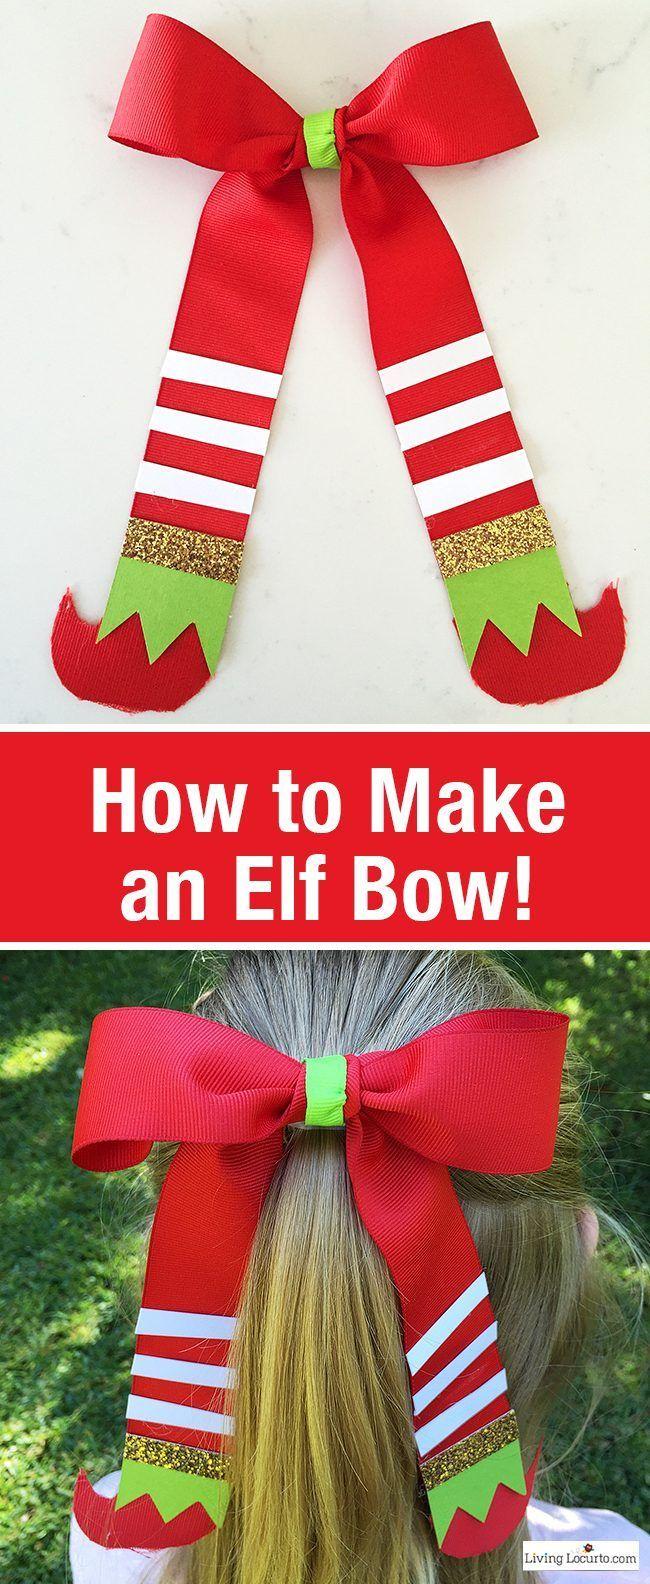 Hair stylist christmas ornaments - How To Make An Elf Bow